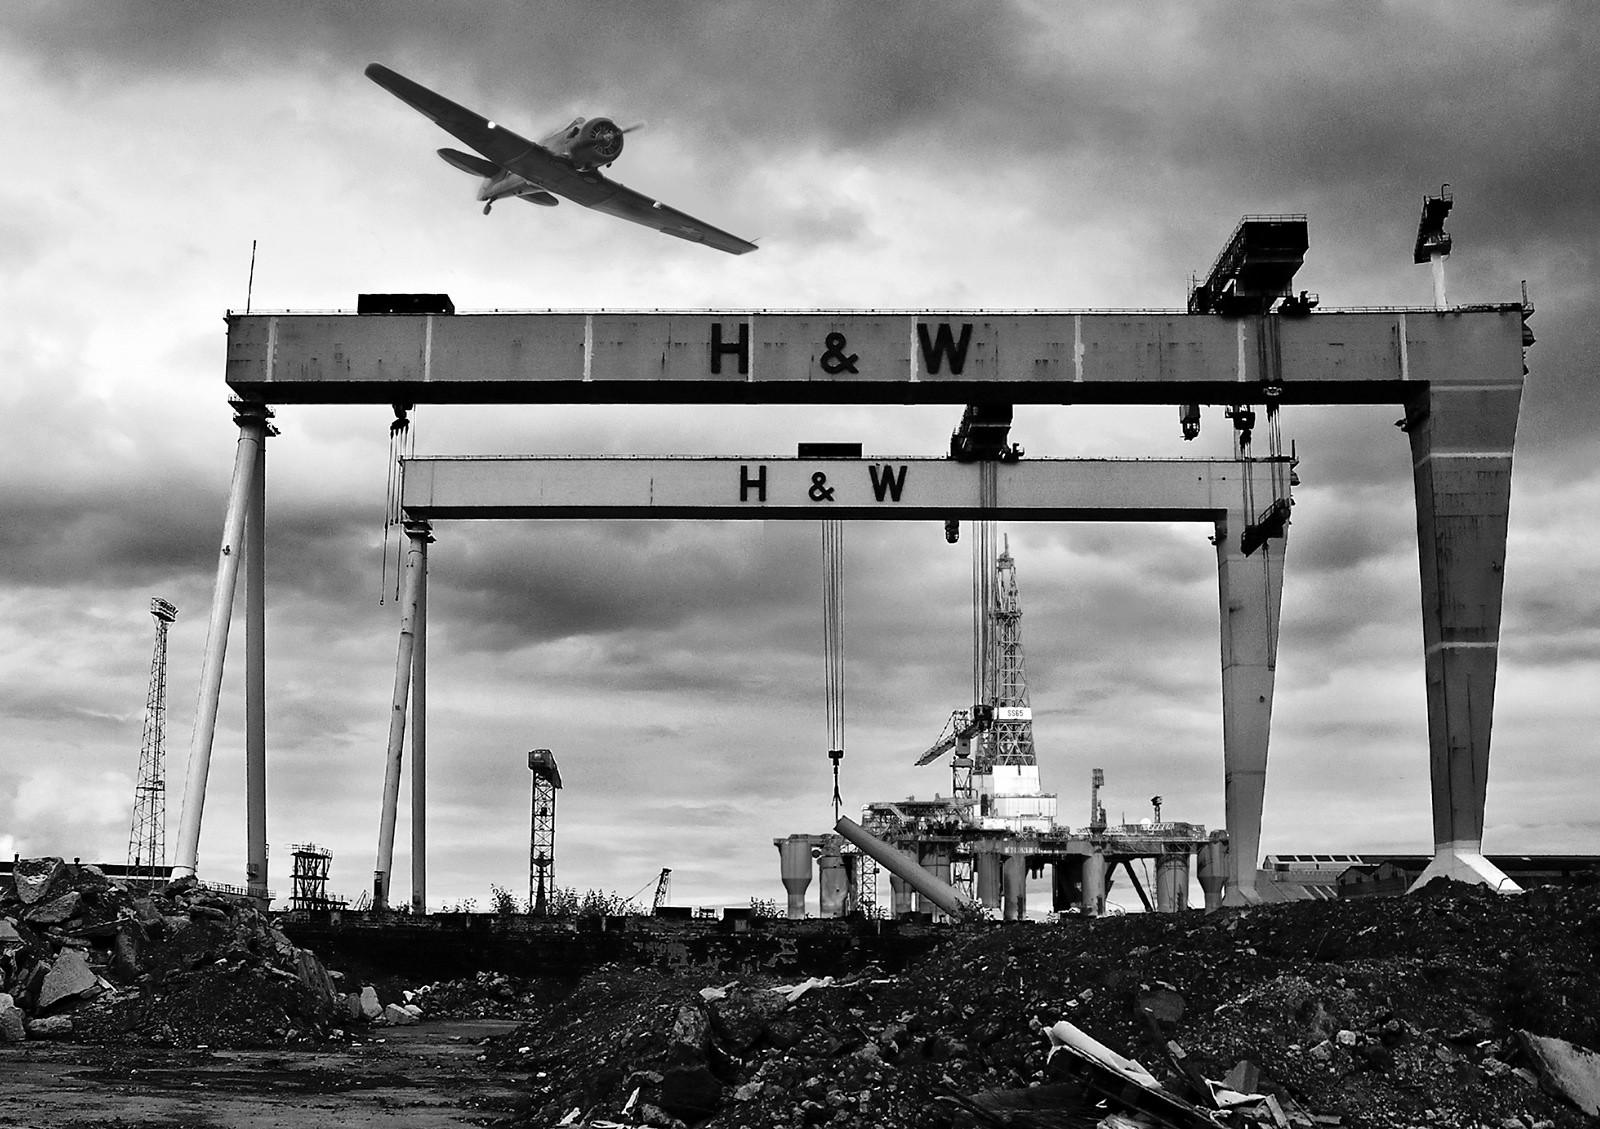 MONO - Shipyard Airshow by Danny McCaughan (9 marks)